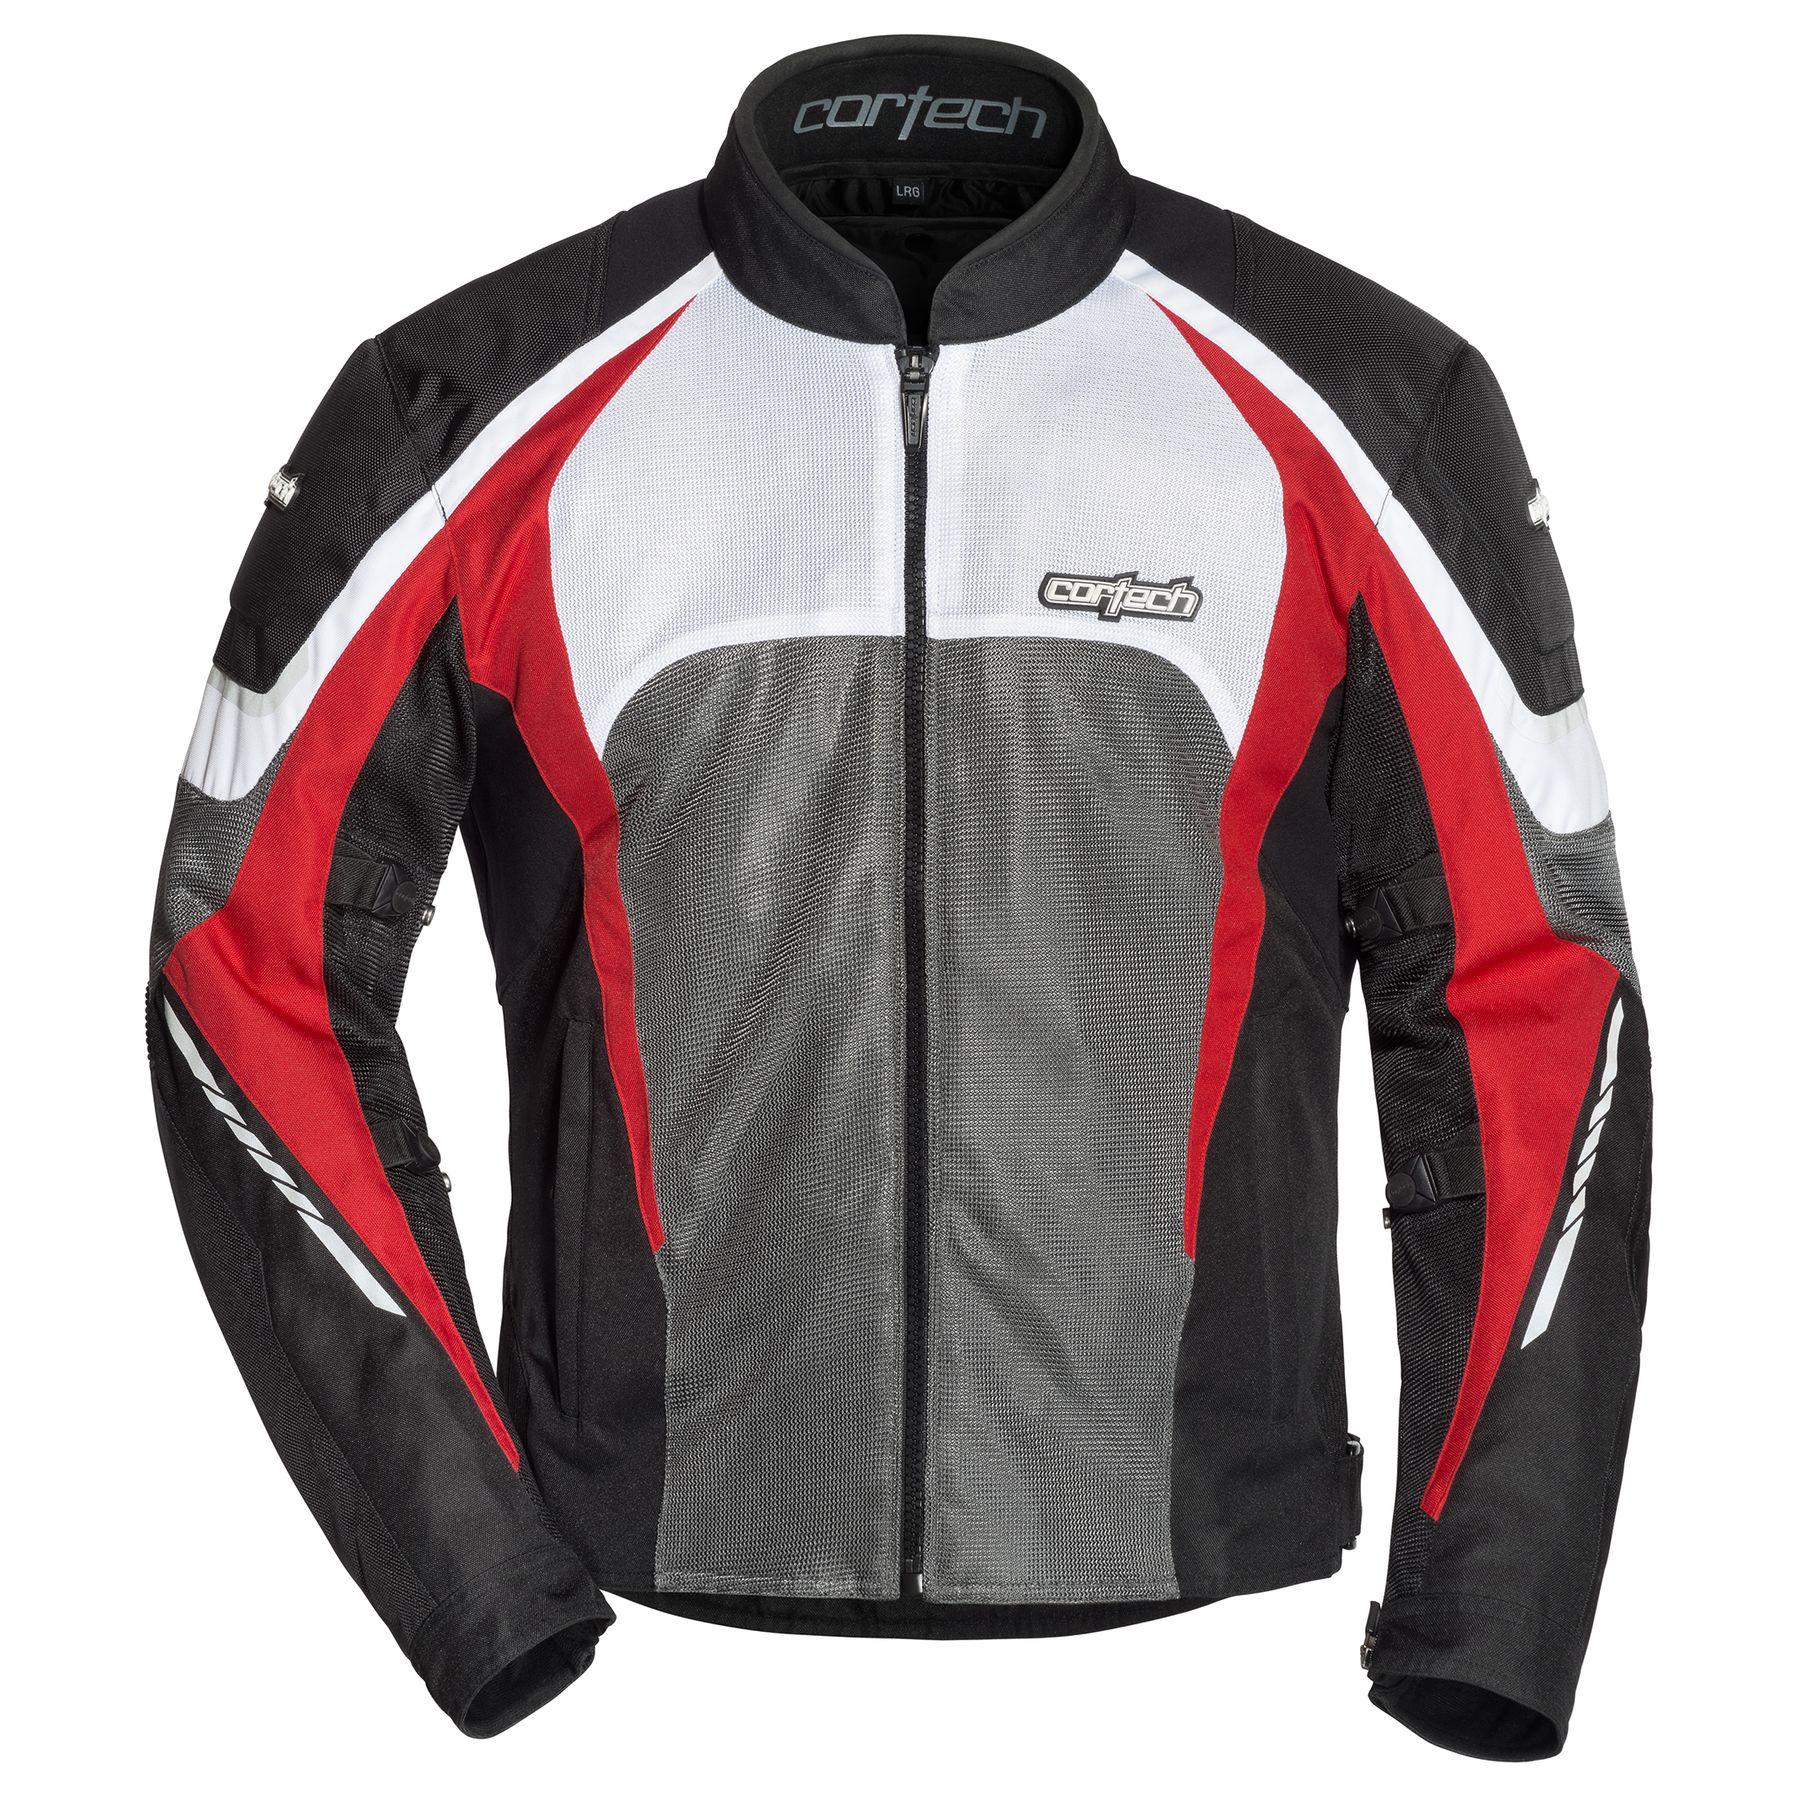 Cortech GX Sport Air 5.0 Mens Jacket Black/Red